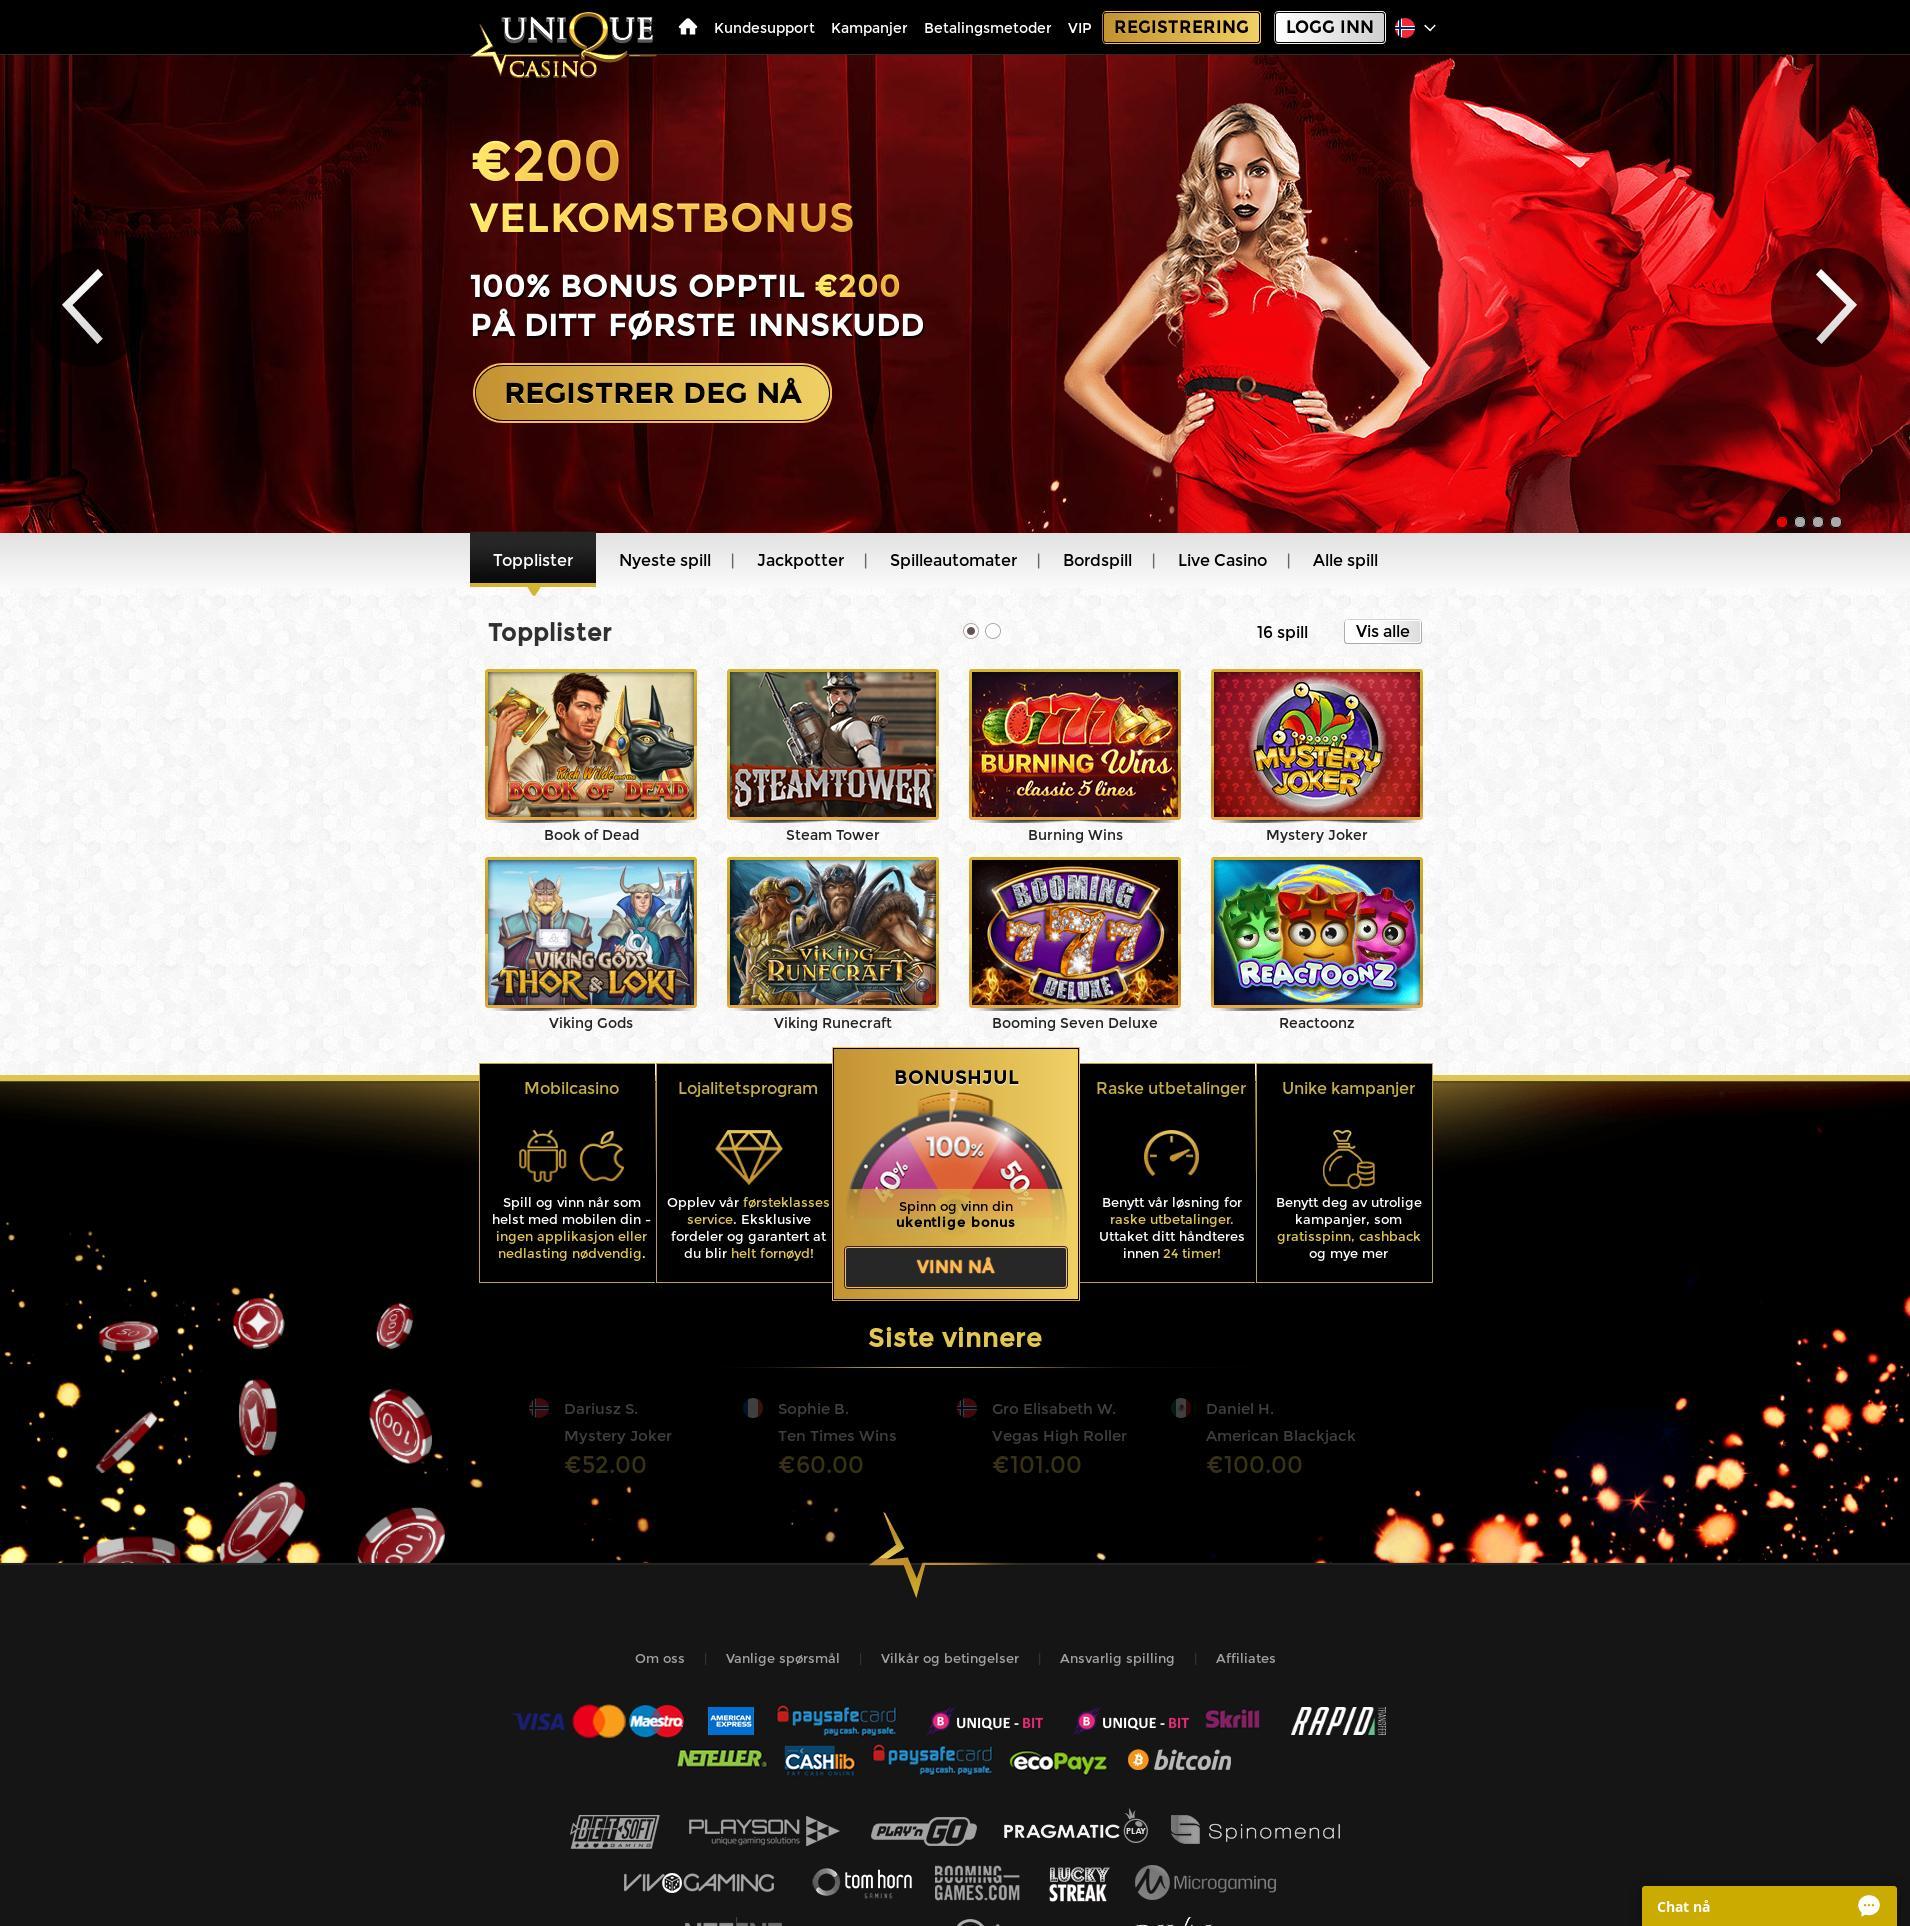 Casino skärm Lobby 2019-07-16 för Norge